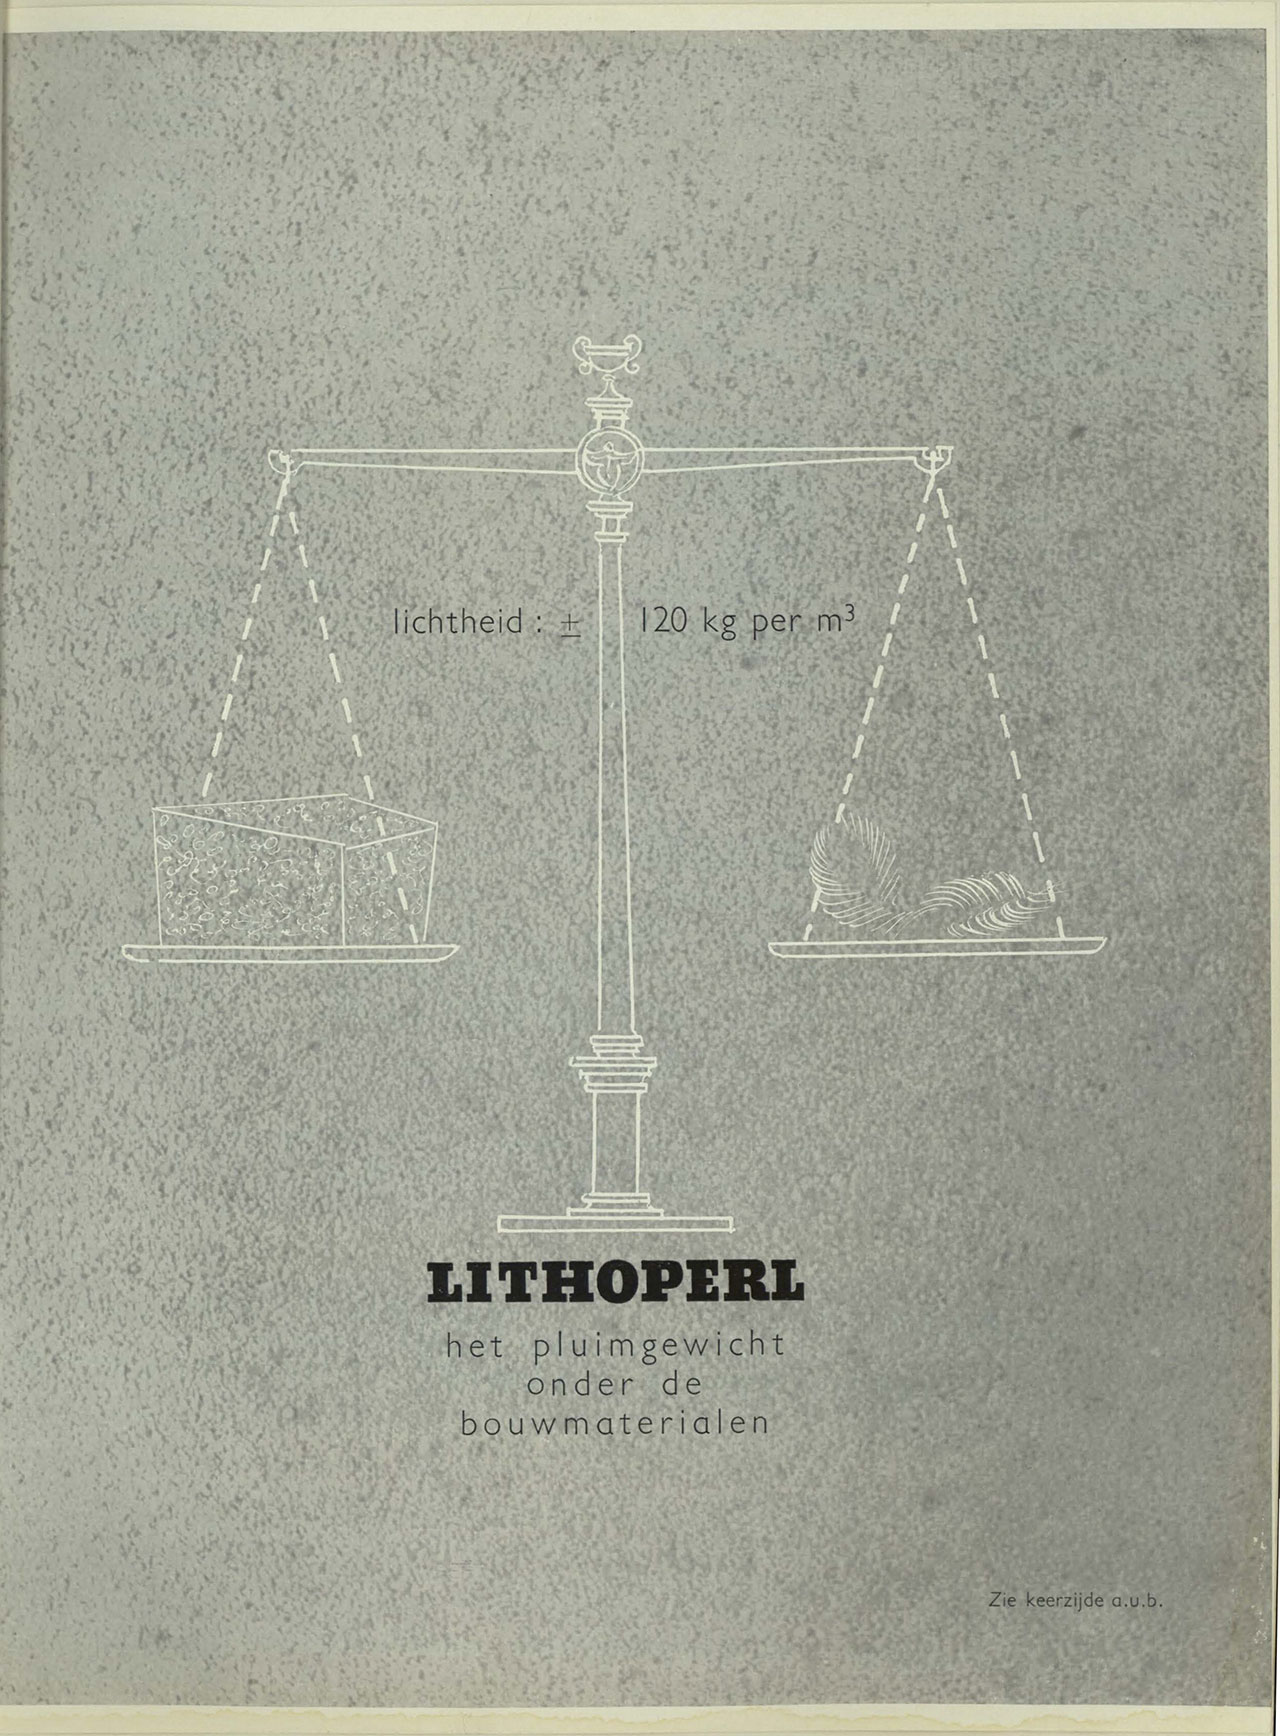 Lithoperl